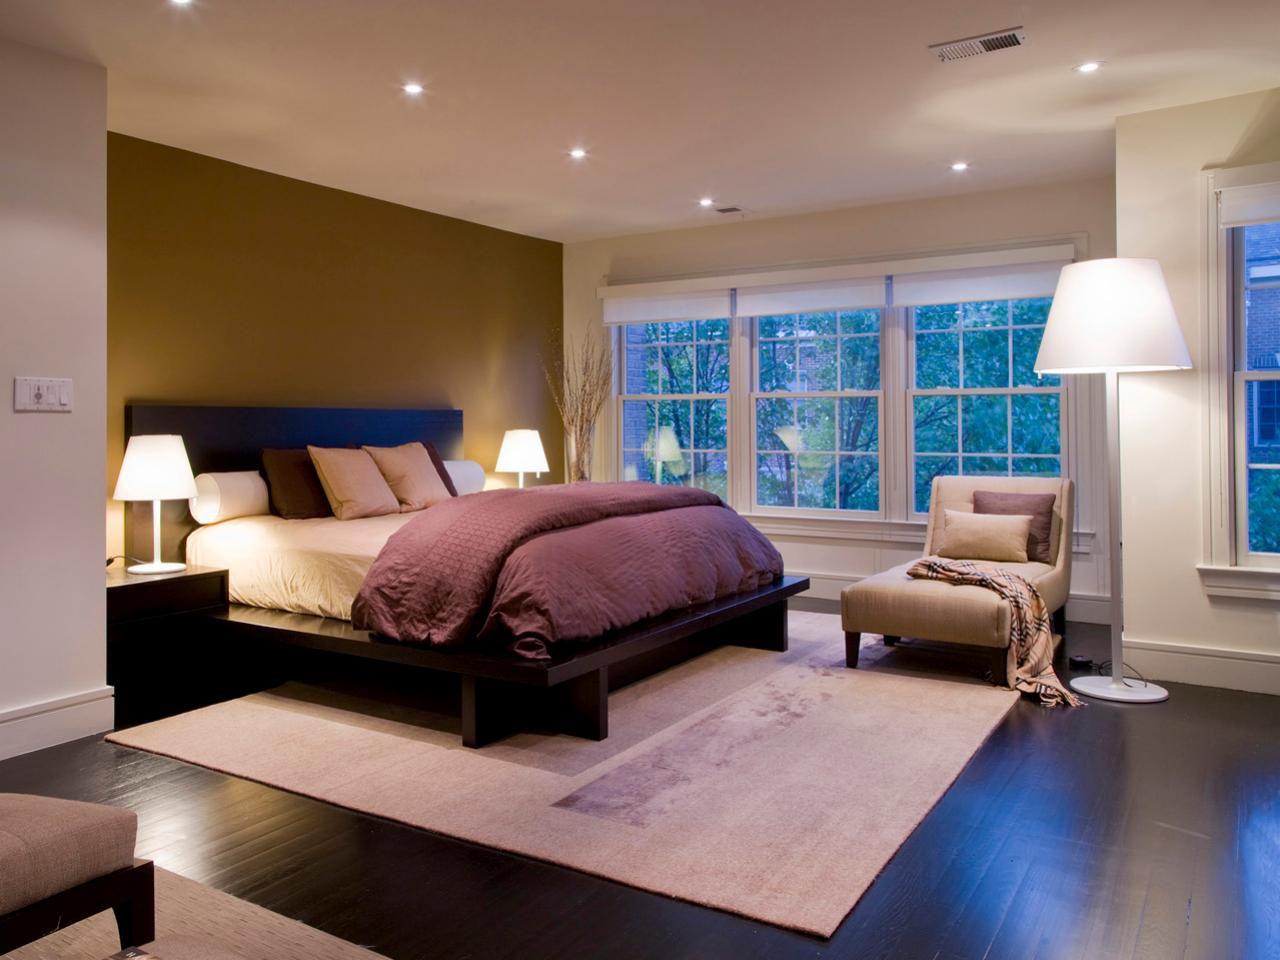 dazzling design ideas bedroom recessed lighting. Dazzling Design Ideas Bedroom Recessed Lighting. Lighting R A